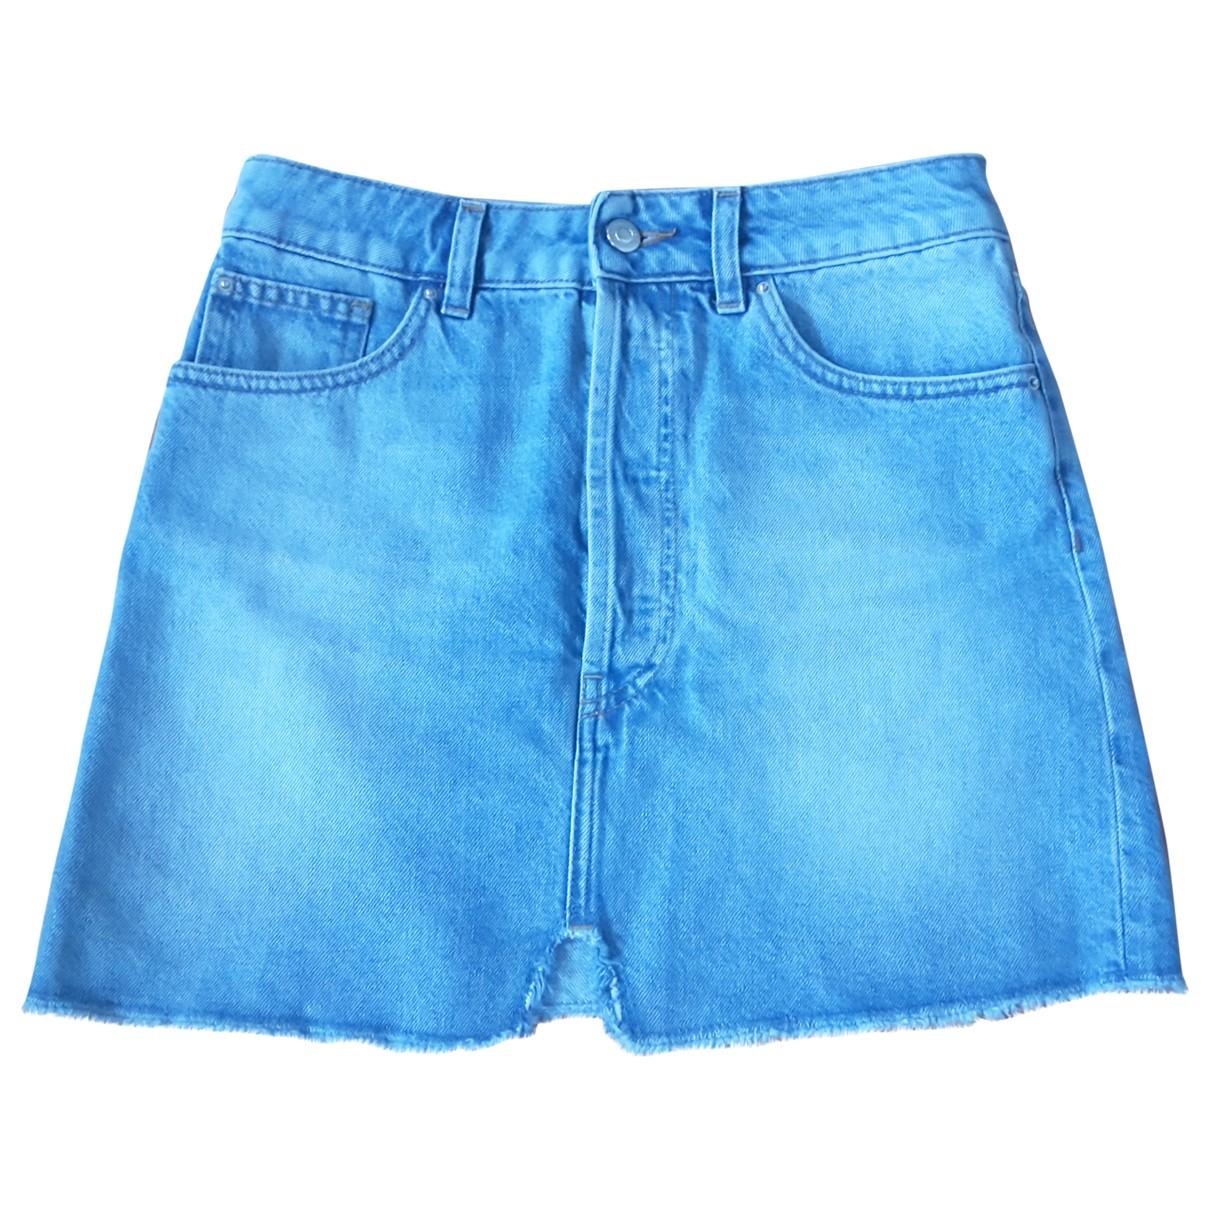 Iro Spring Summer 2019 Rocke in  Blau Denim - Jeans